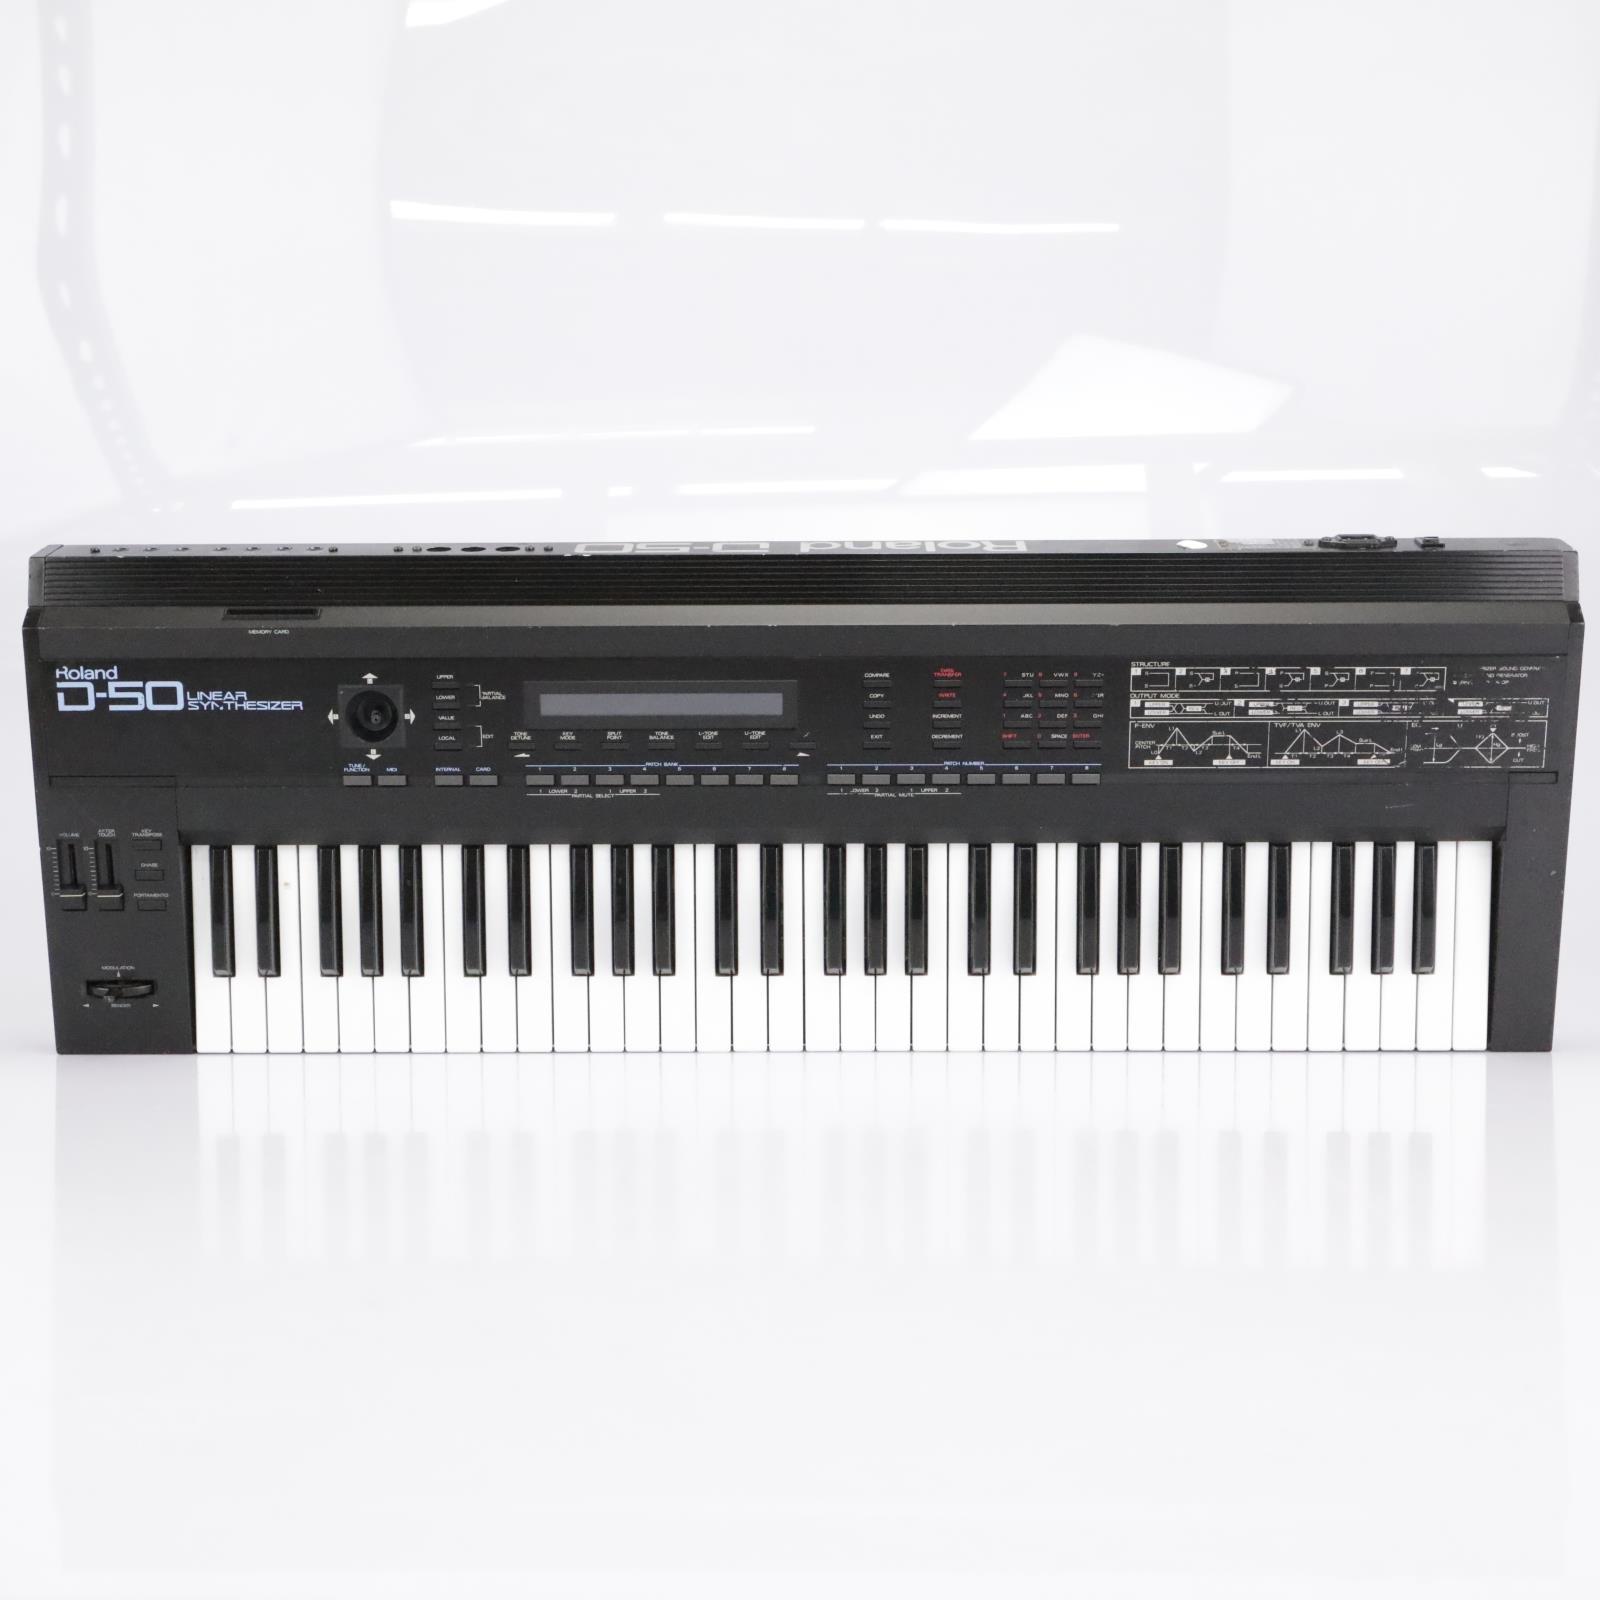 Roland D-50 Linear Synthesizer Digital Keyboard #43001